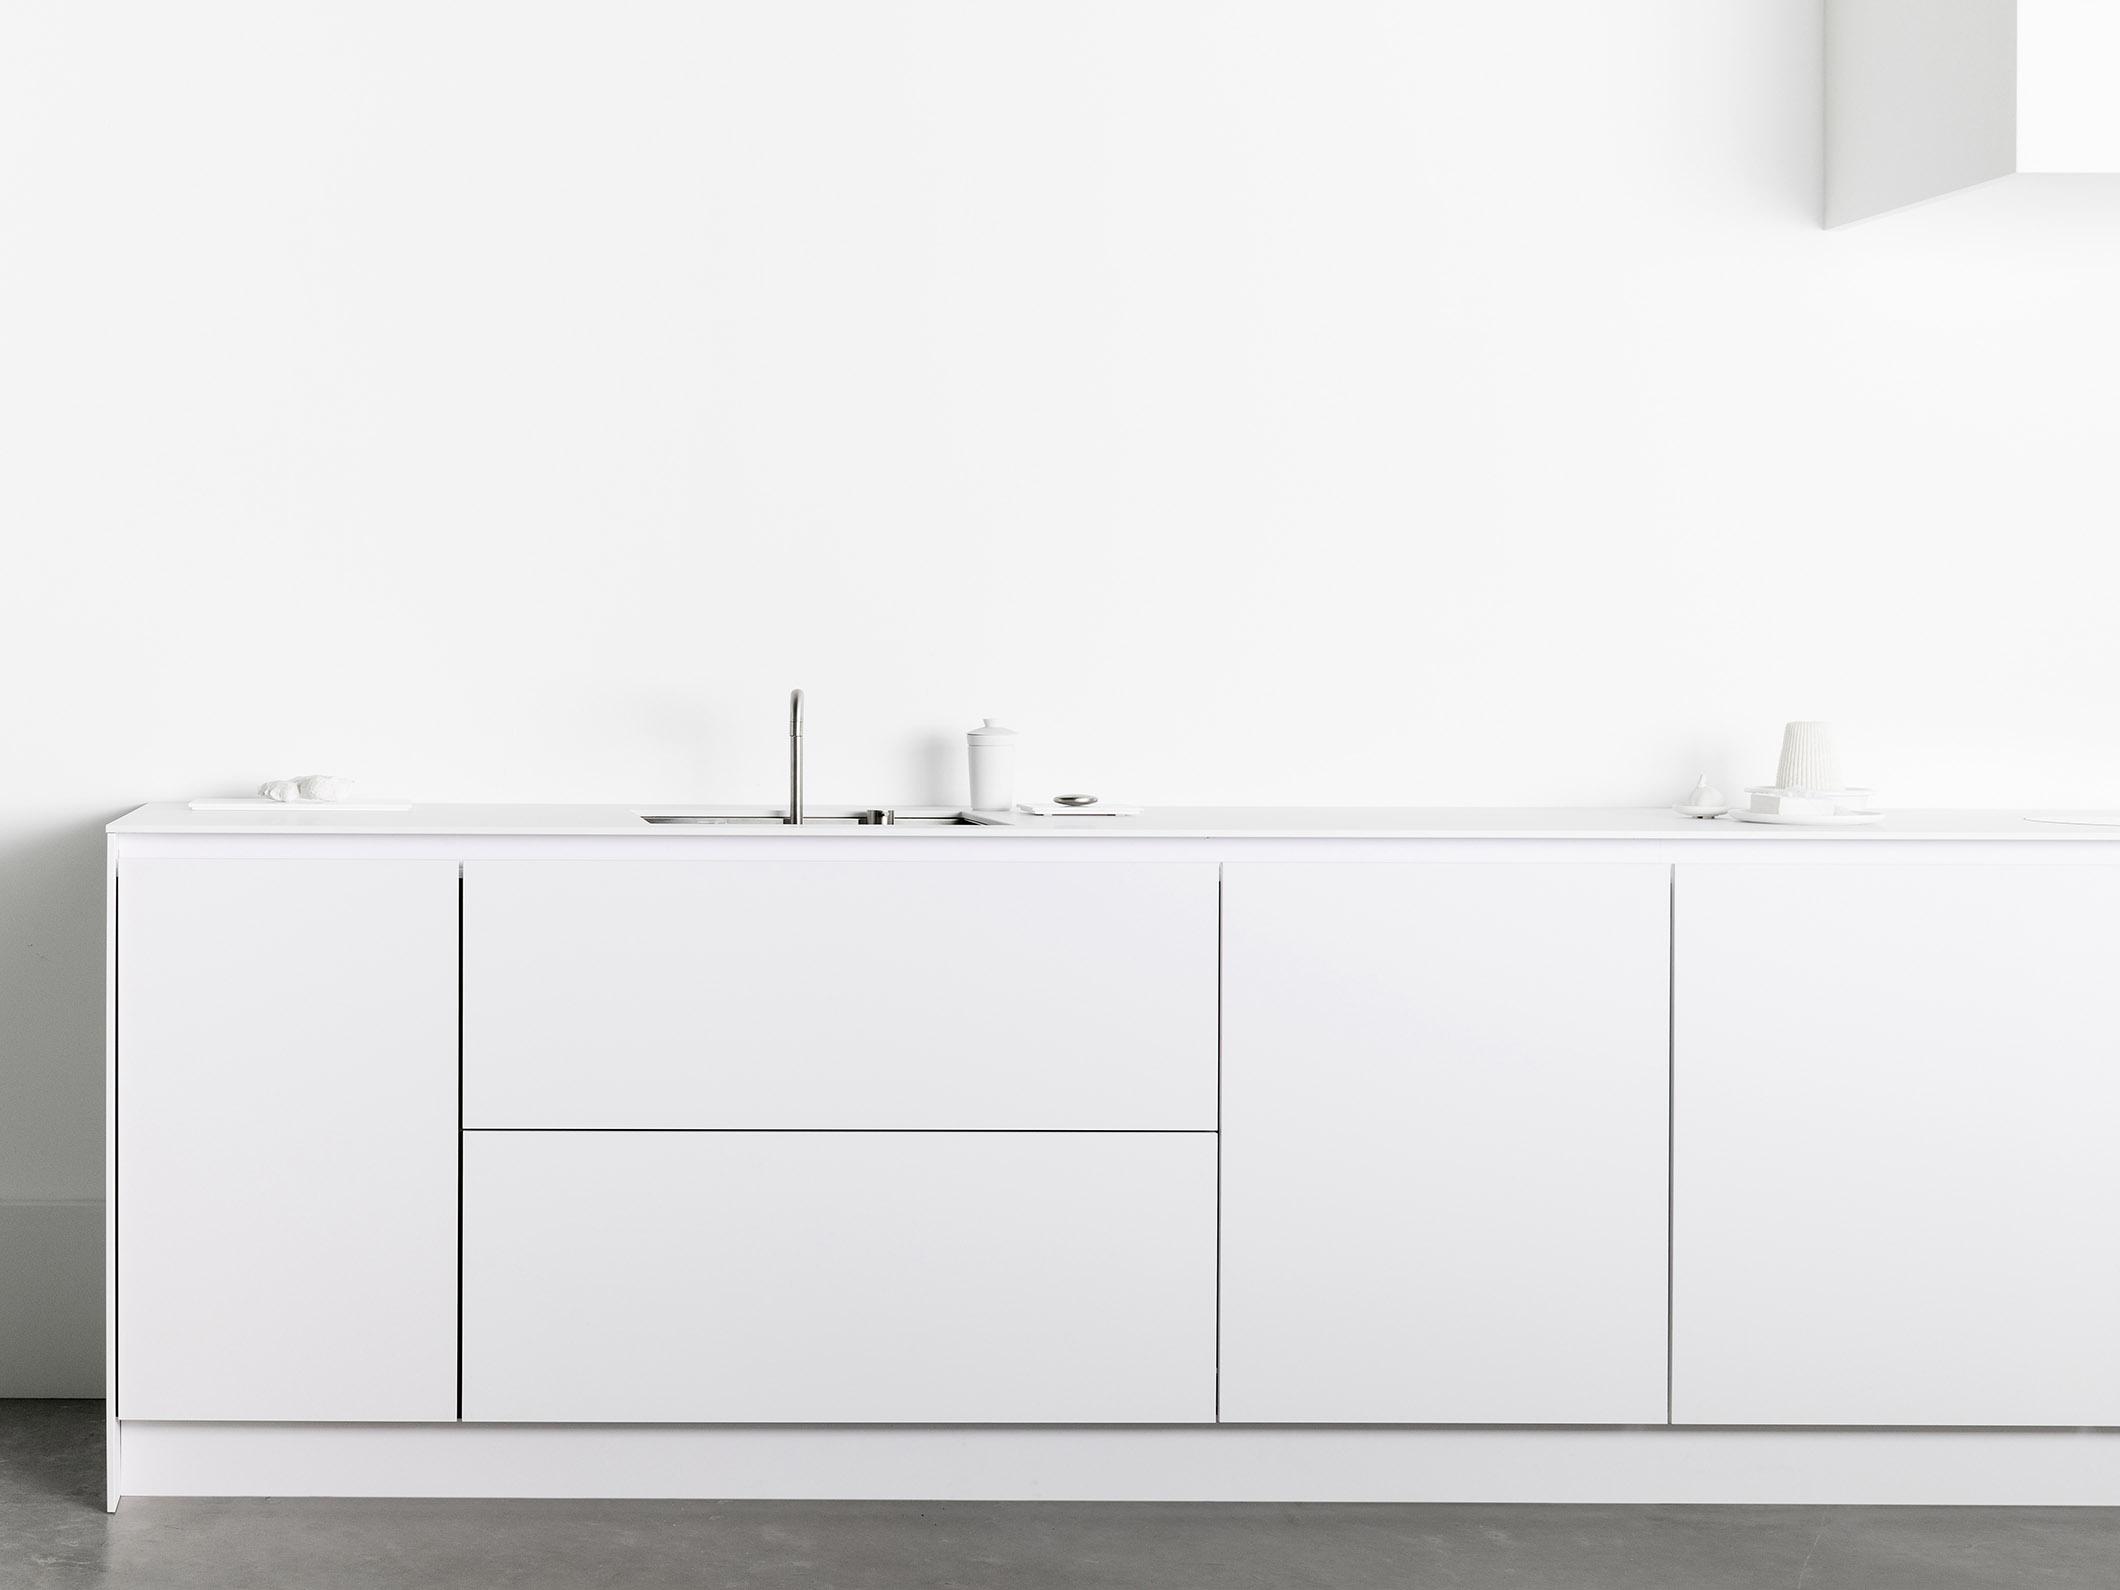 MINIMAL kitchen and tableware by Serax